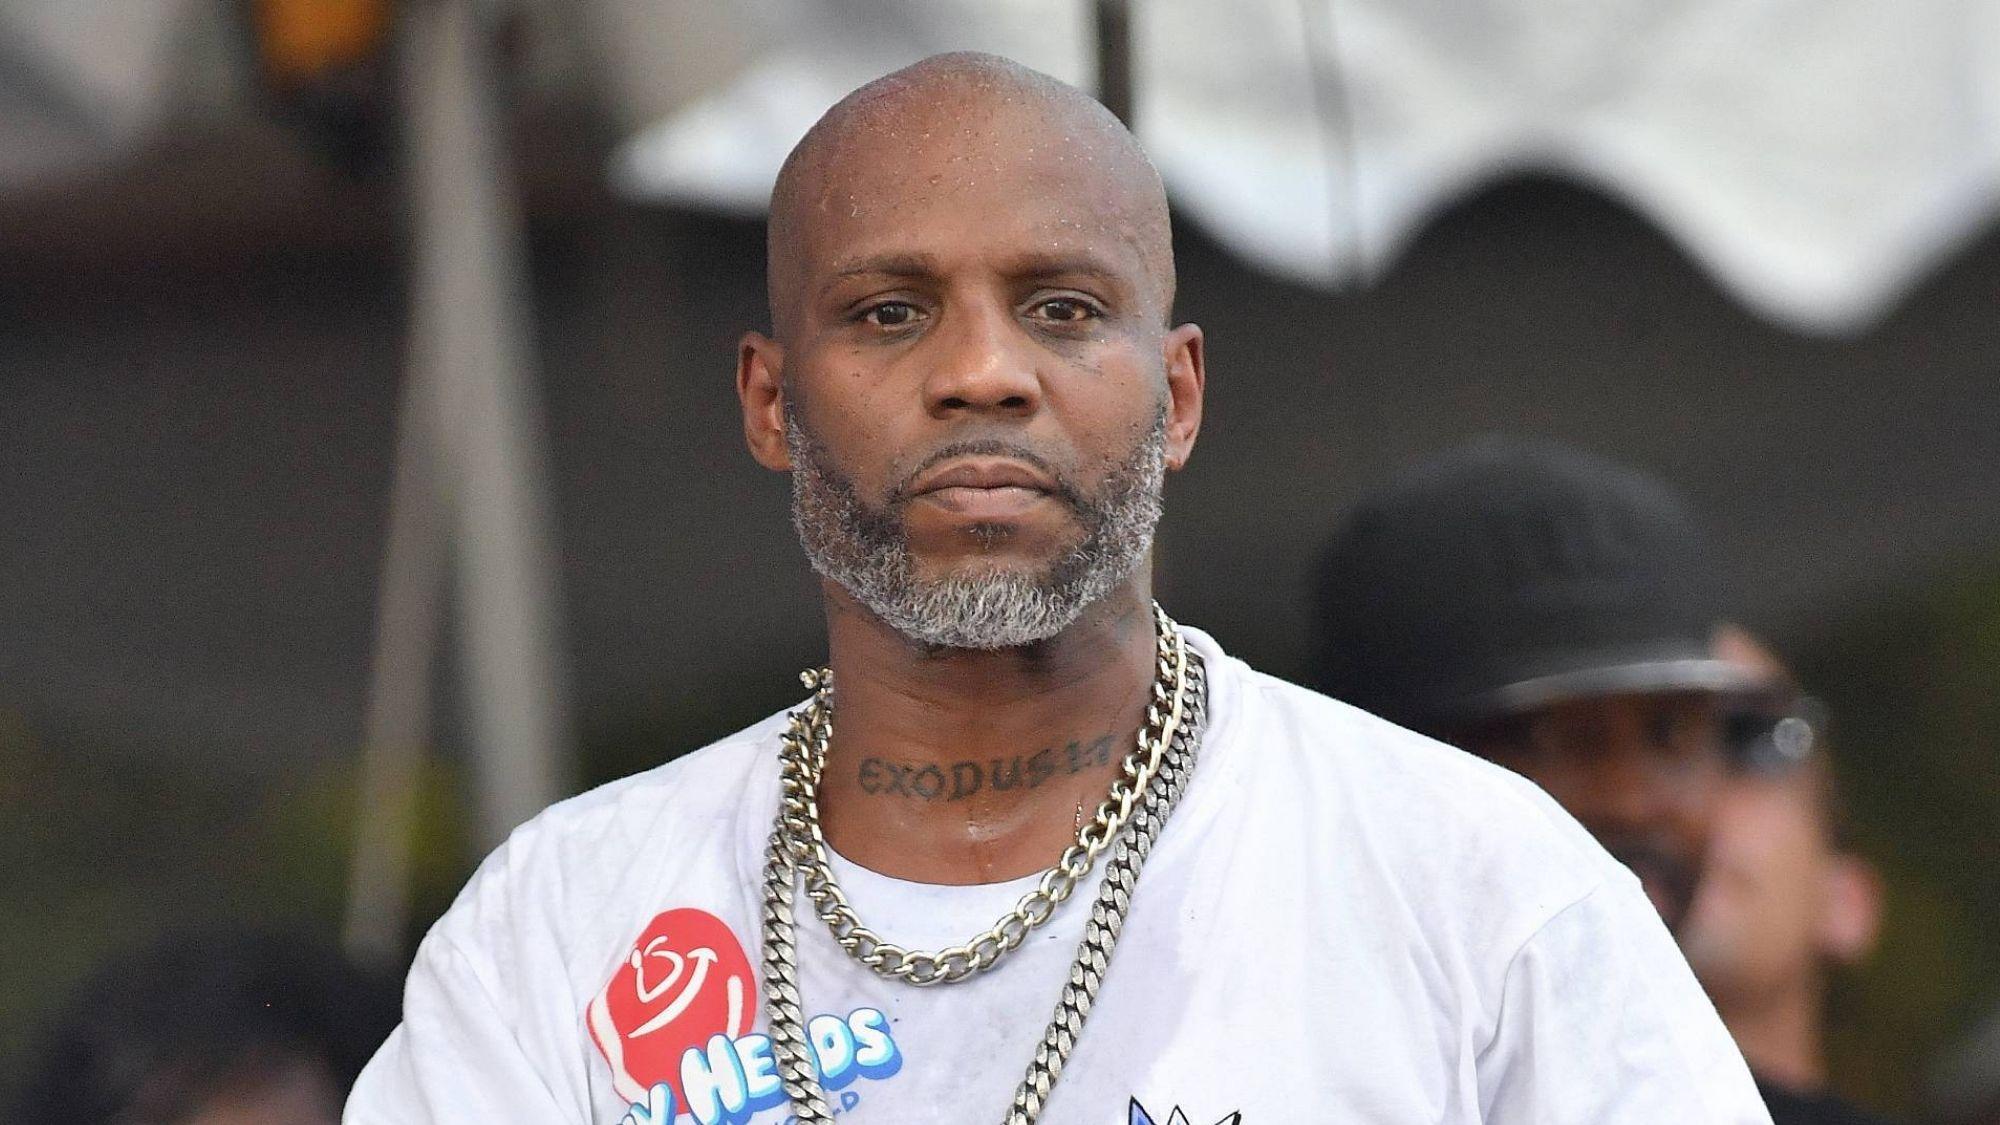 Rap icon DMX passes away